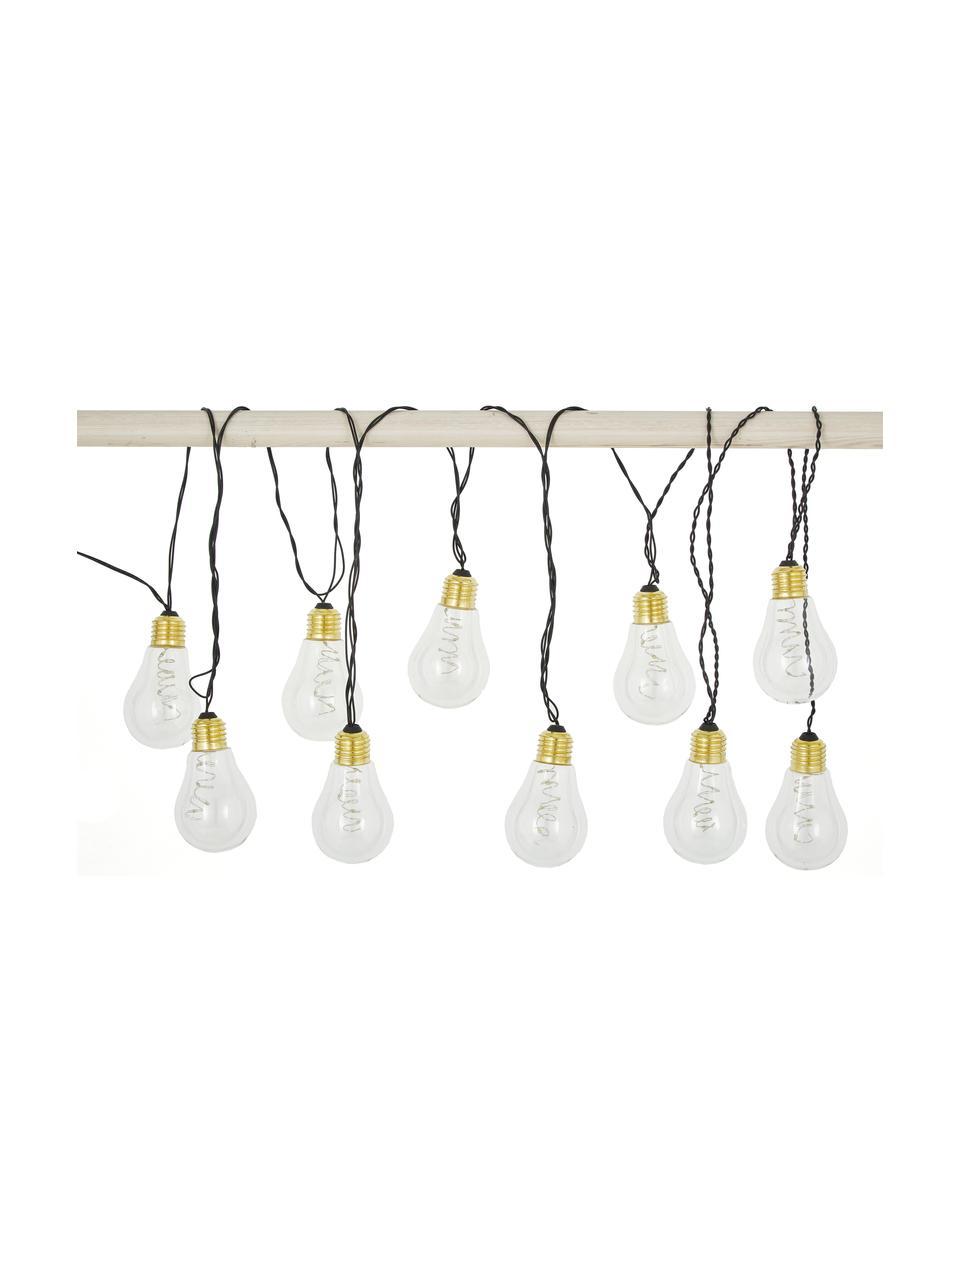 Ghirlanda  a LED Bulb, 360 cm, 10 lampioni, Lampadina: materiale sintetico, meta, Lampadina: trasparente, dorato, Cavo: nero, Lung. 360 cm